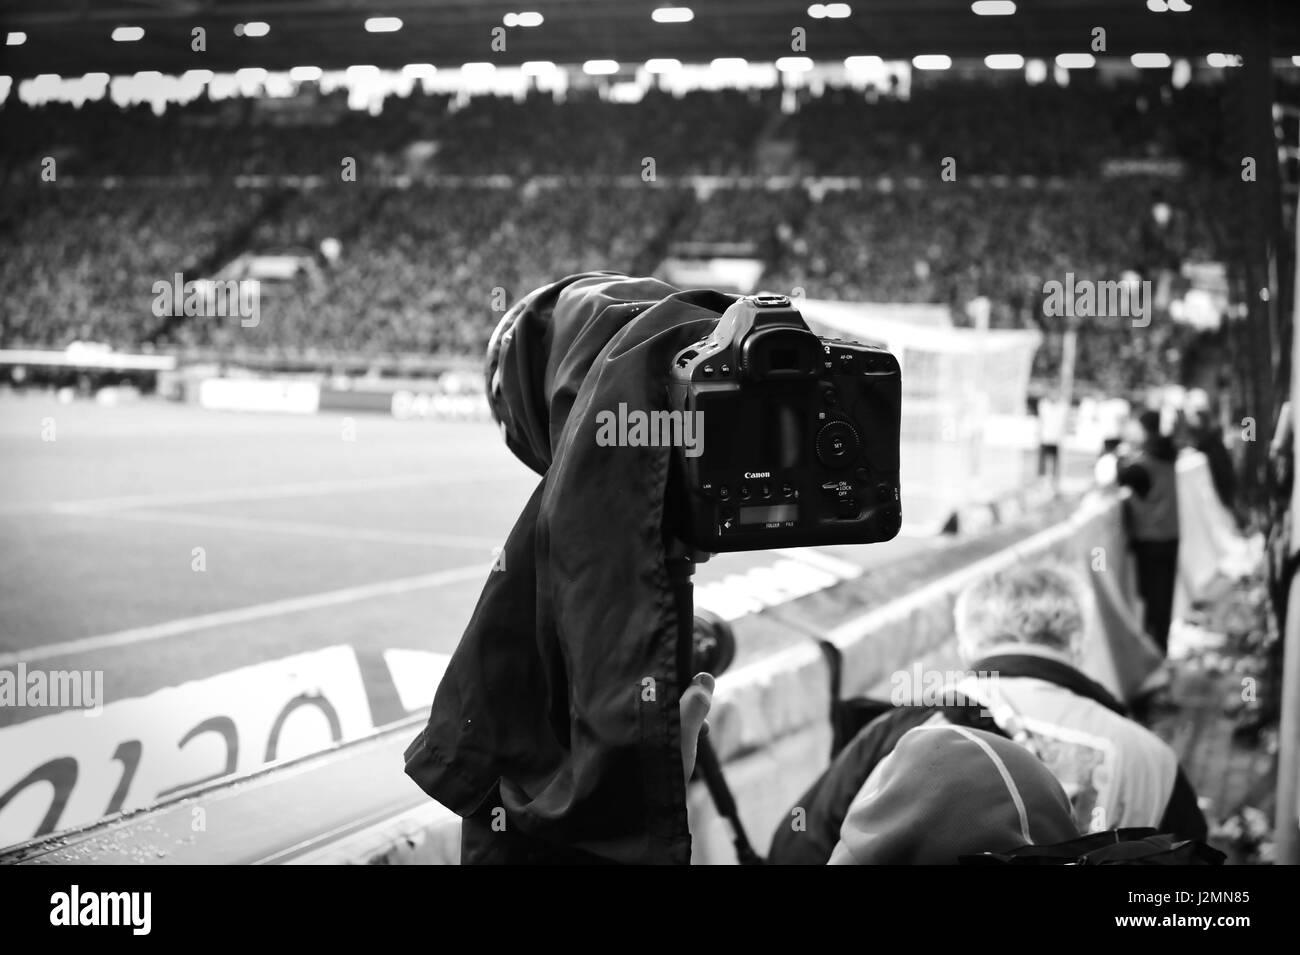 Photographers at work, Millerntor Stadion, Hamburg, Germany - Stock-Bilder